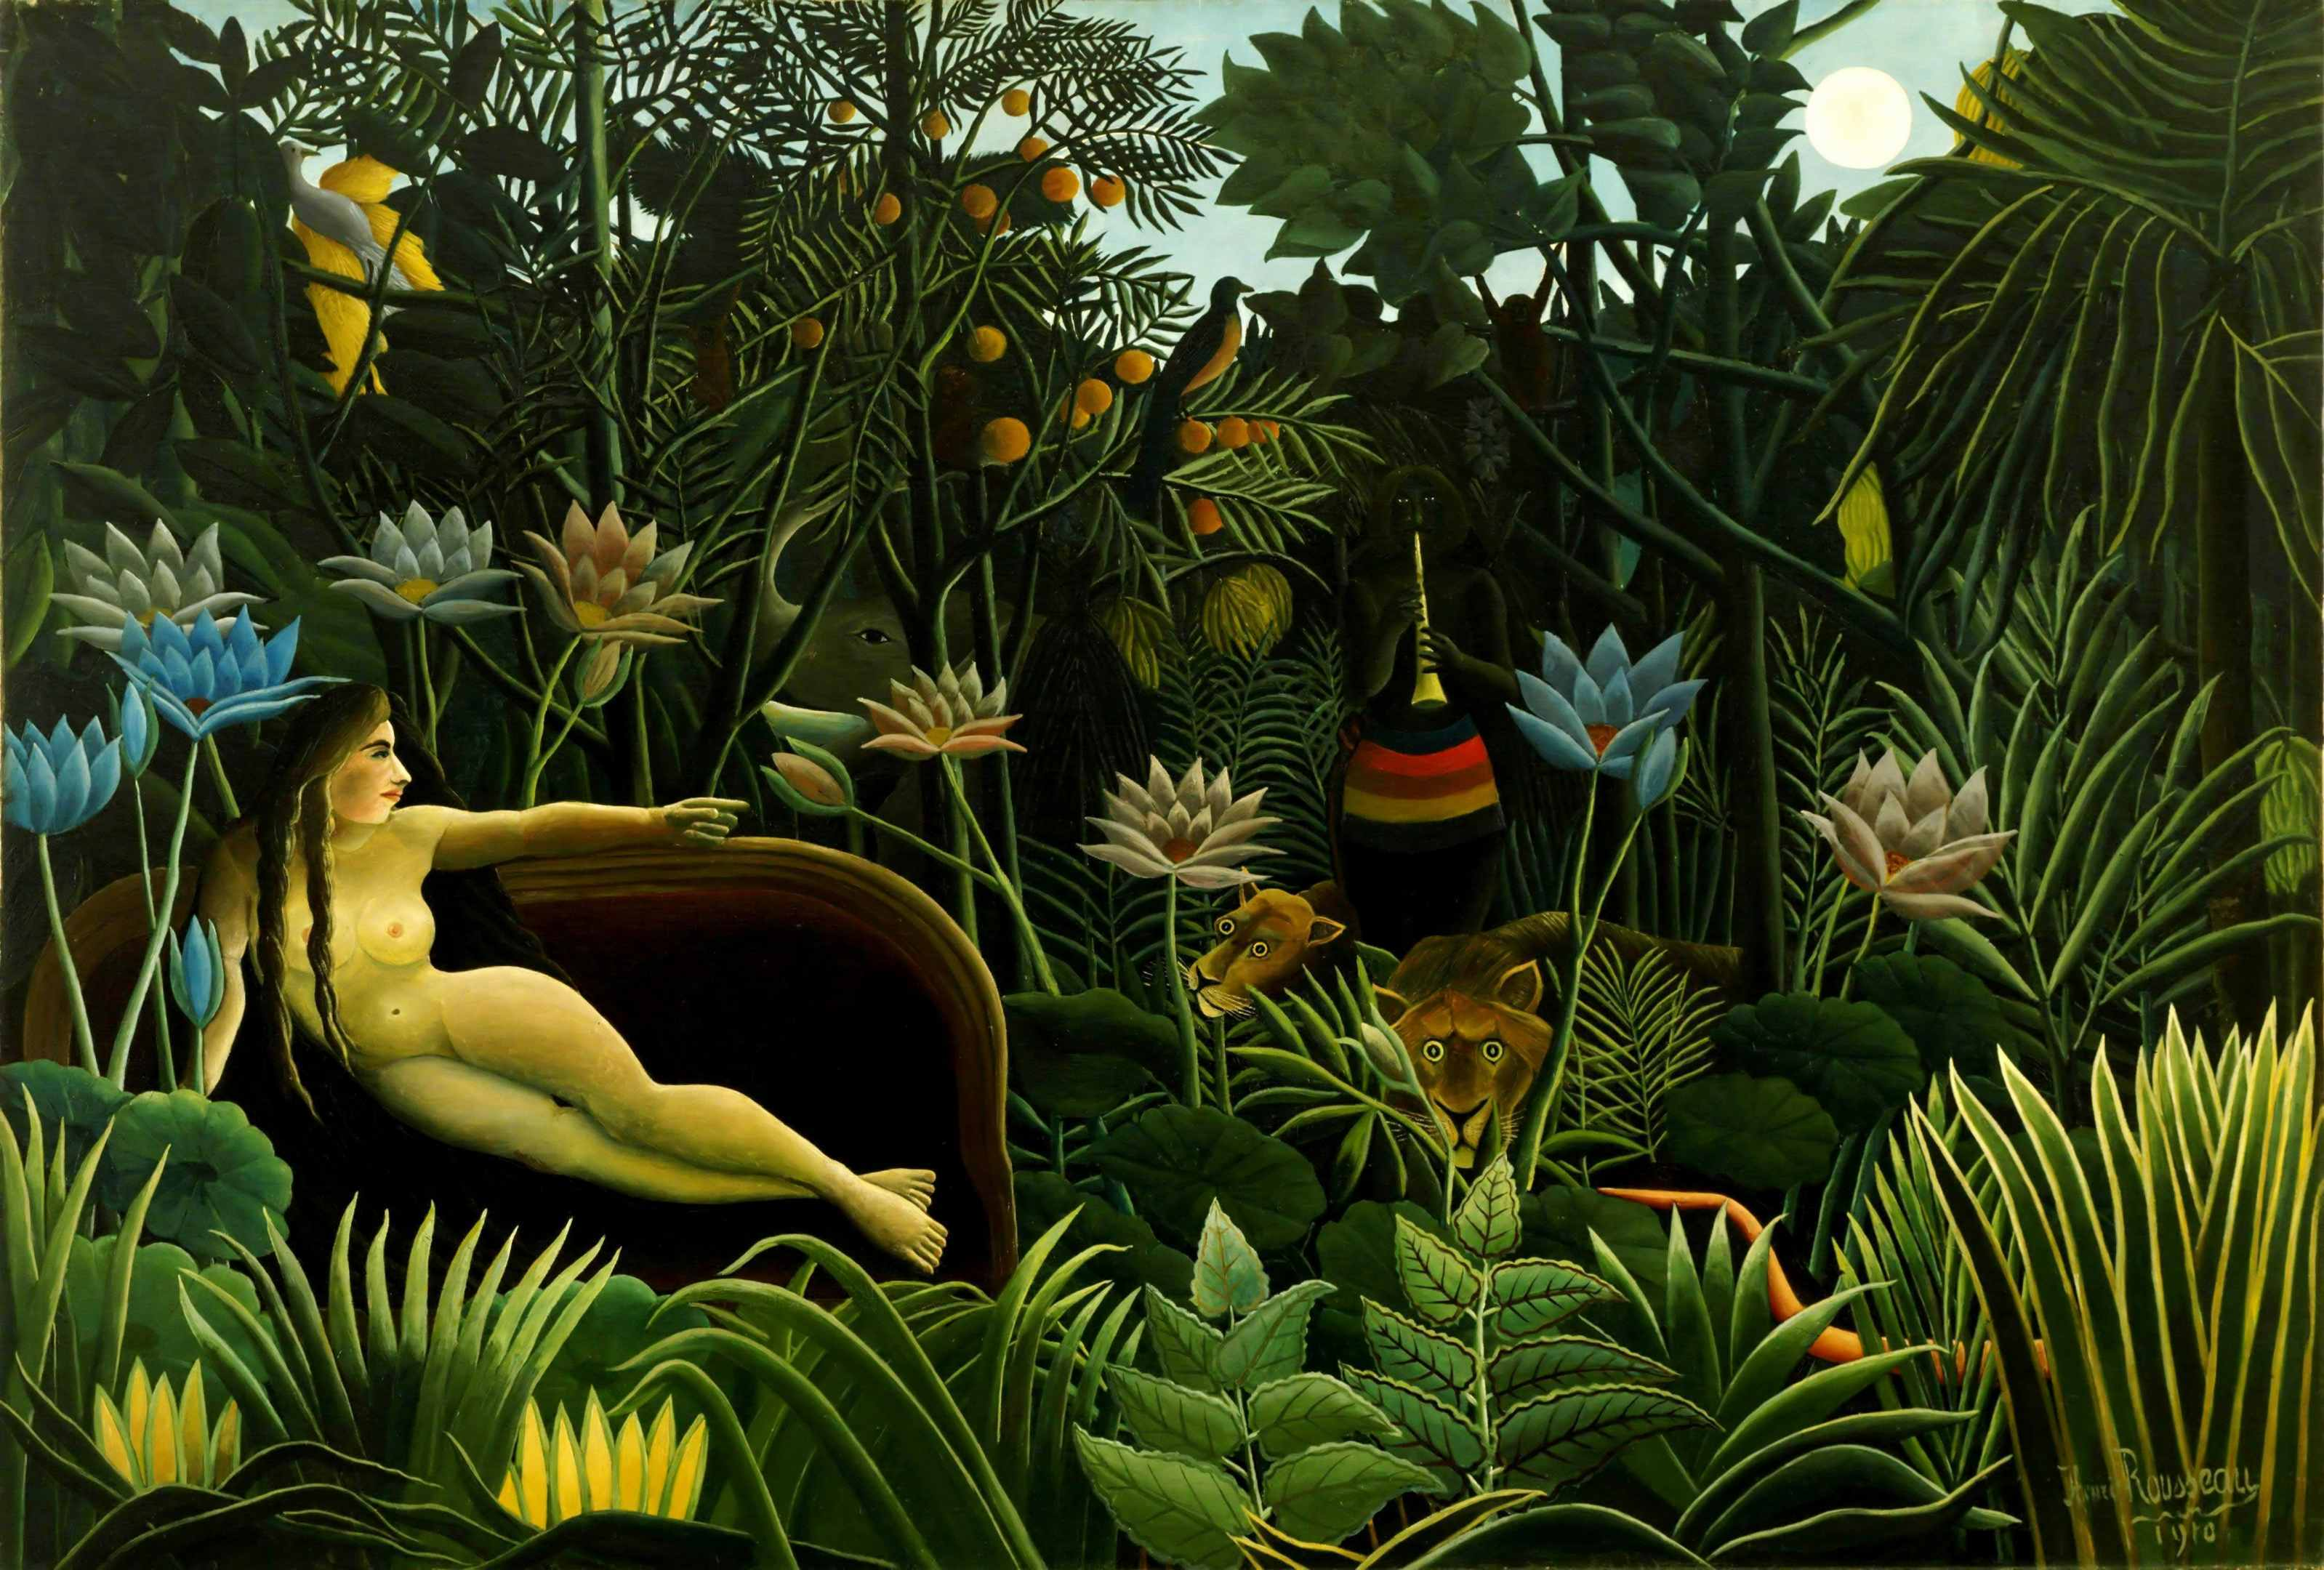 Henri_Rousseau - 夢(1910年)_a0185081_08344508.jpg